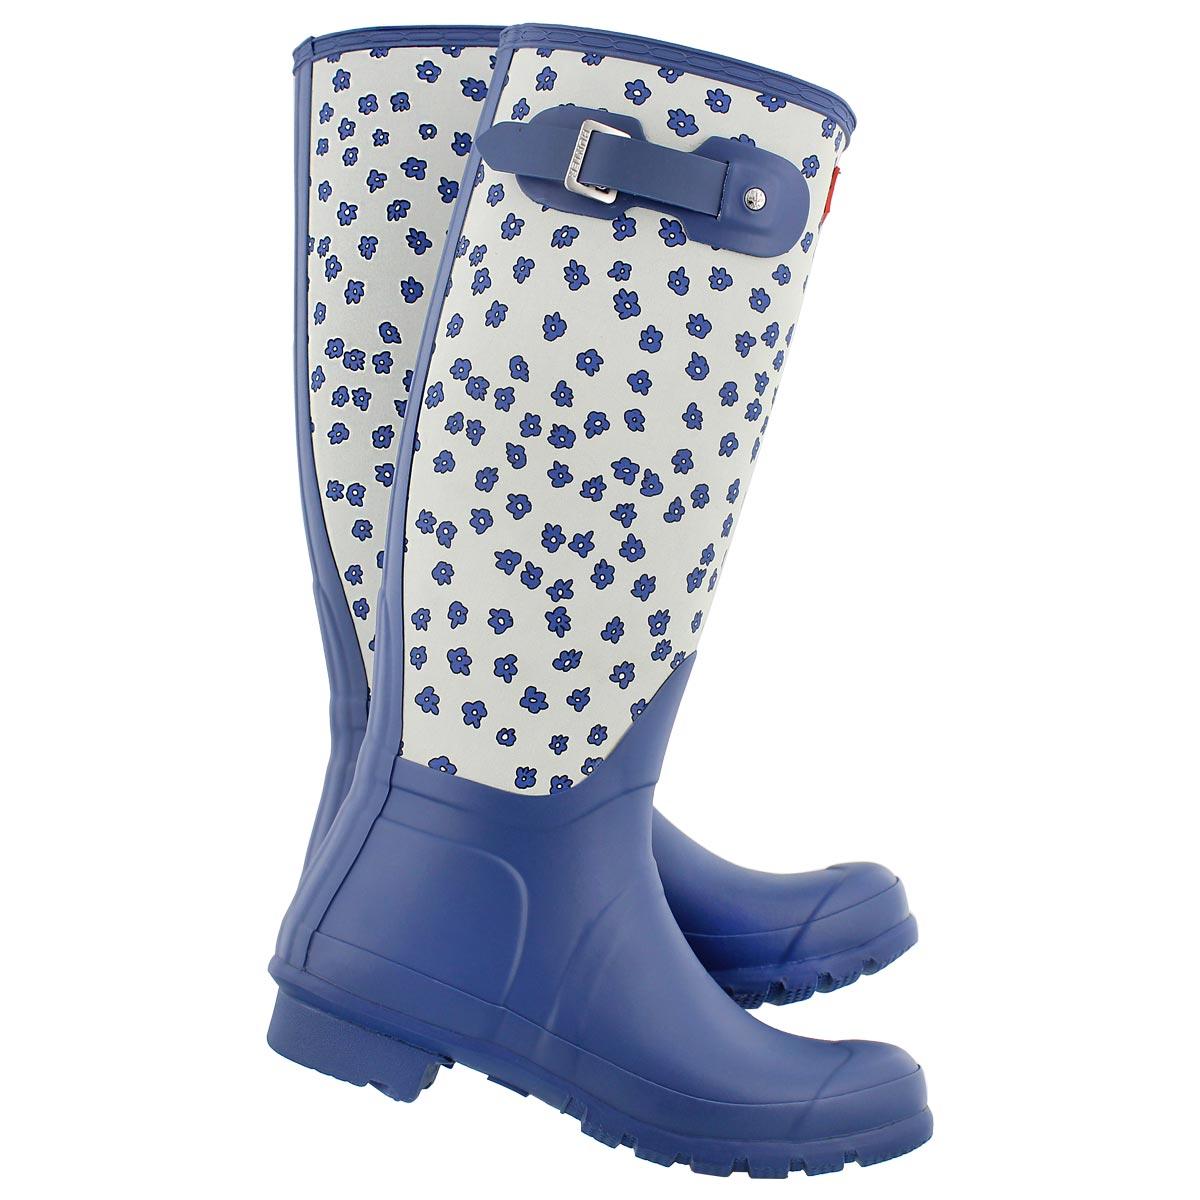 Lds Orig Tall Fest. Floral blue rainboot